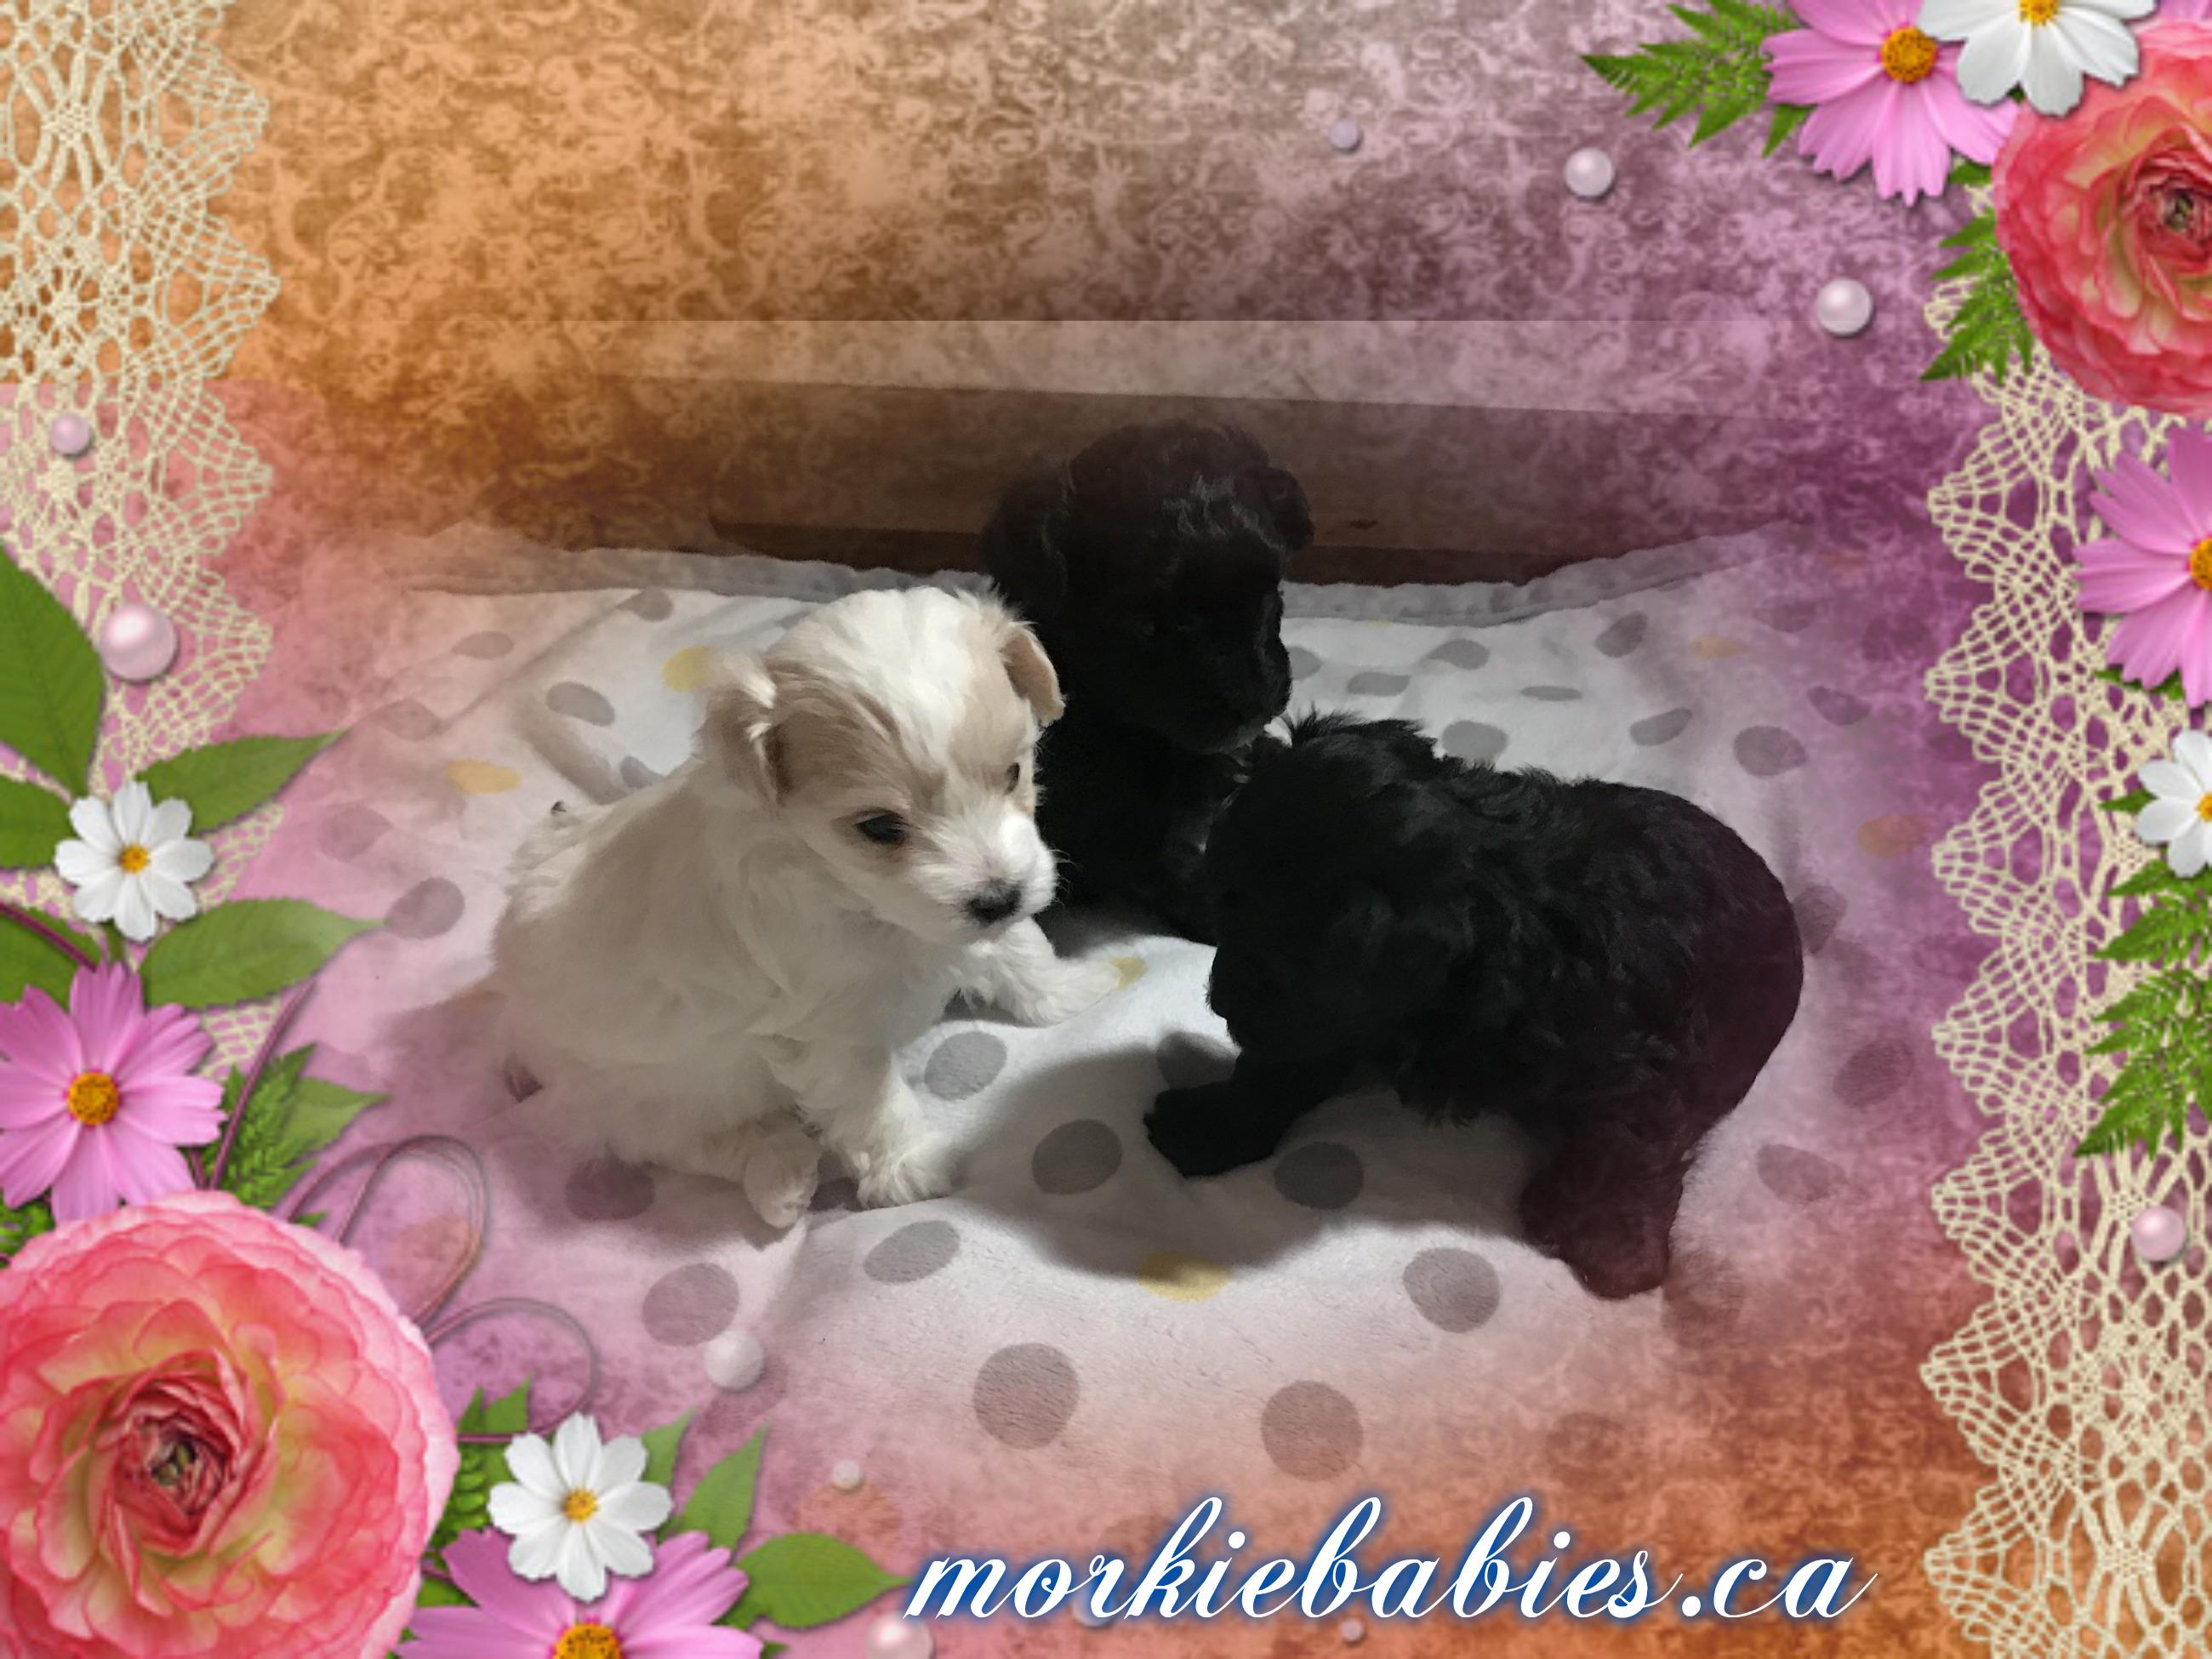 Morkie Babies